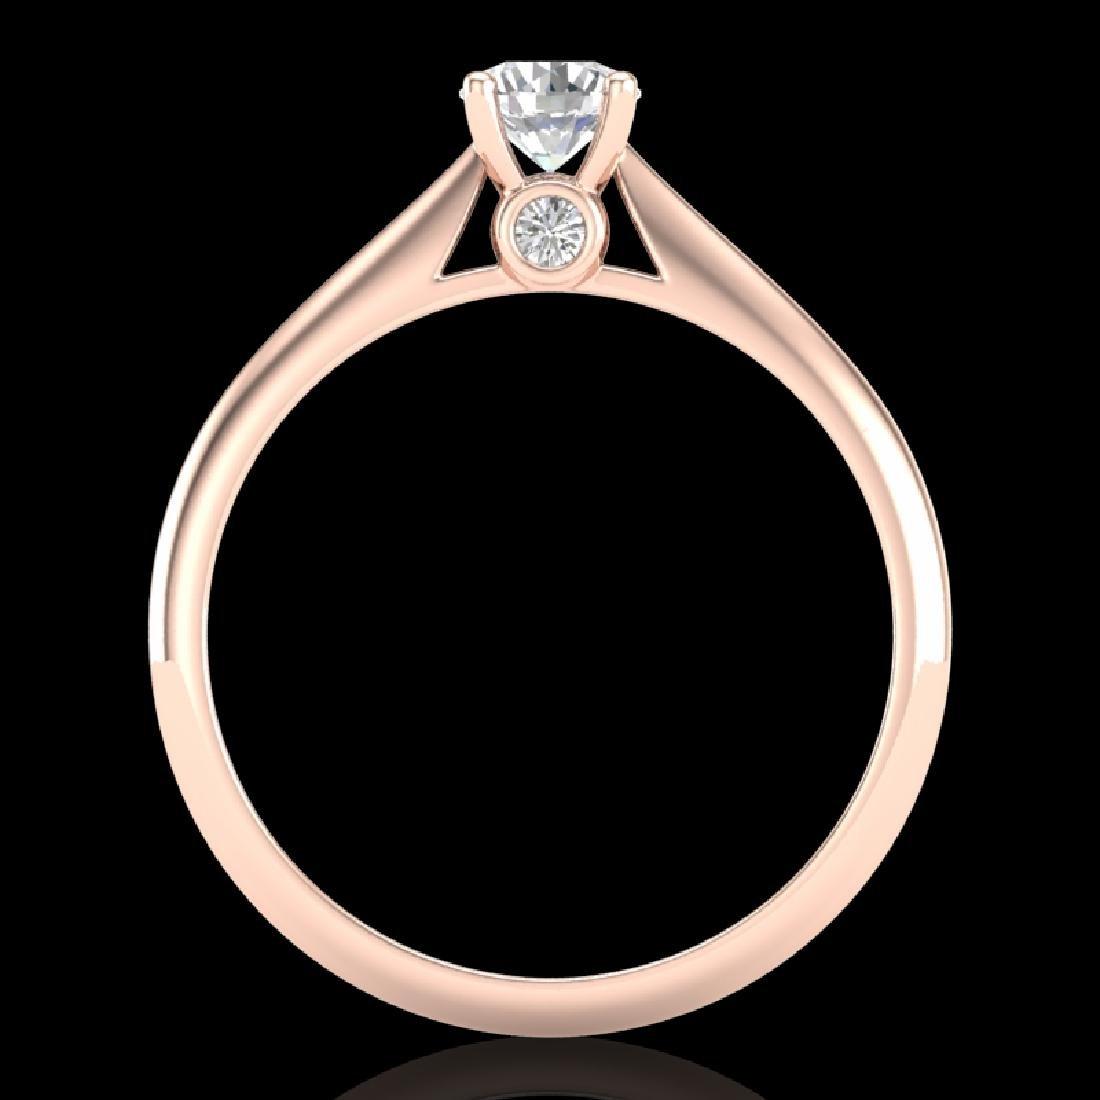 0.4 CTW VS/SI Diamond Solitaire Art Deco Ring 18K Rose - 3